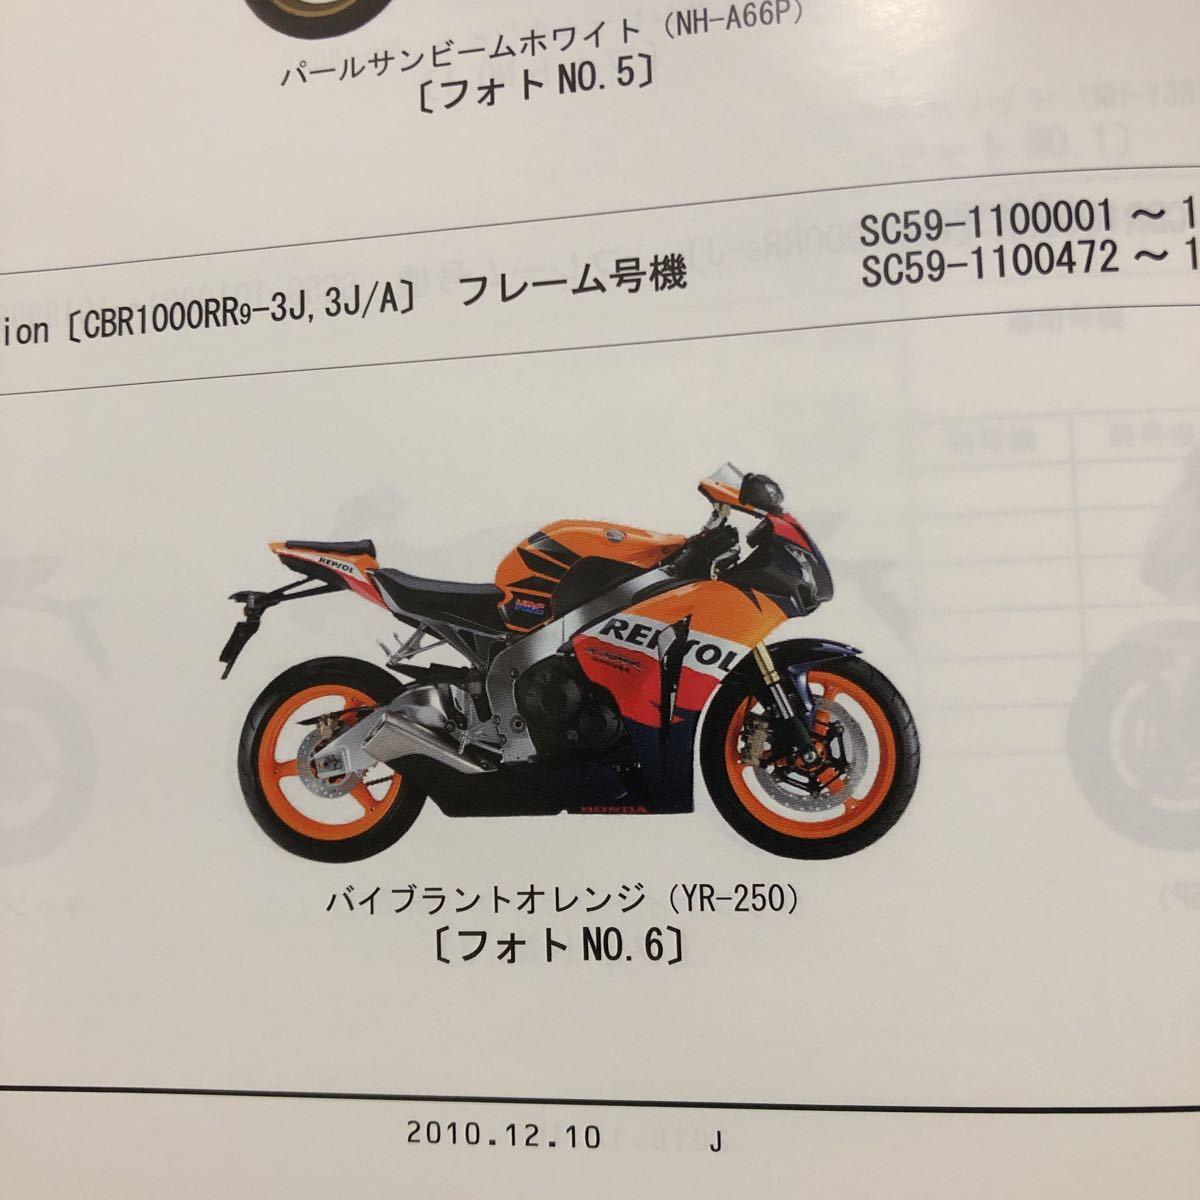 CBR1000RR SC59 パーツカタログ 即決価格で送料無料です_画像4